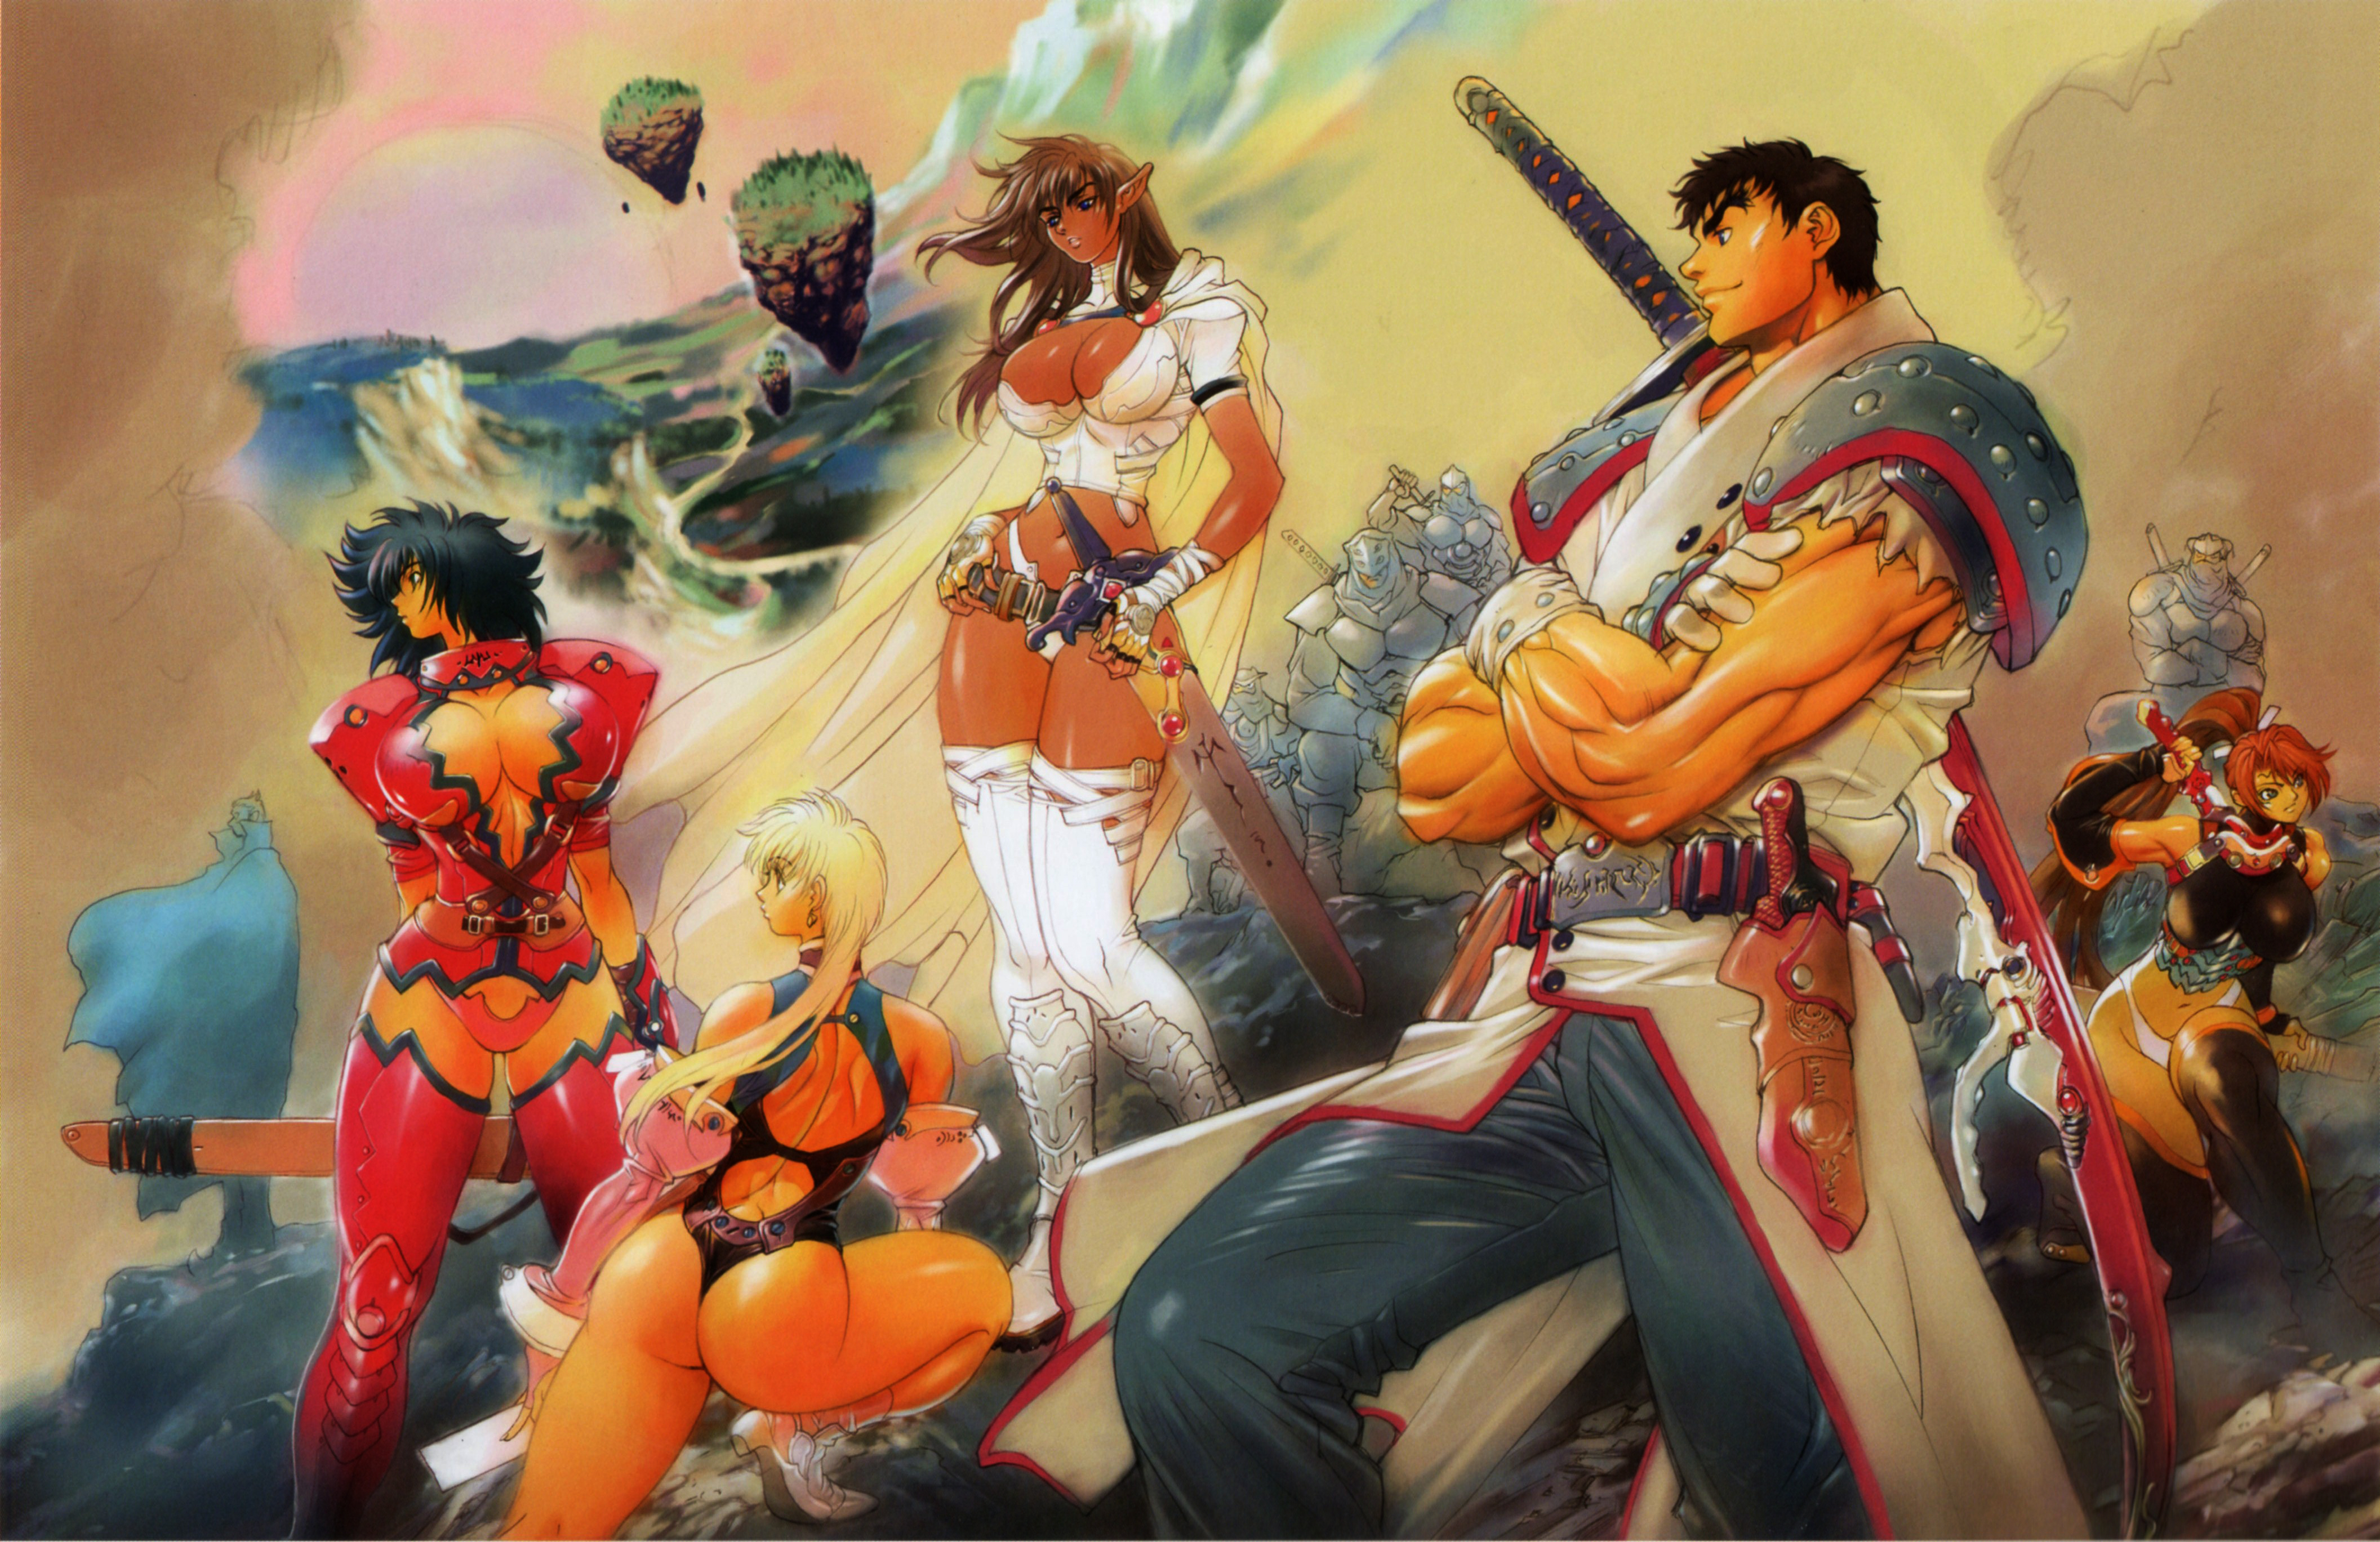 Immagine Le citazioni musicali in manga ed anime